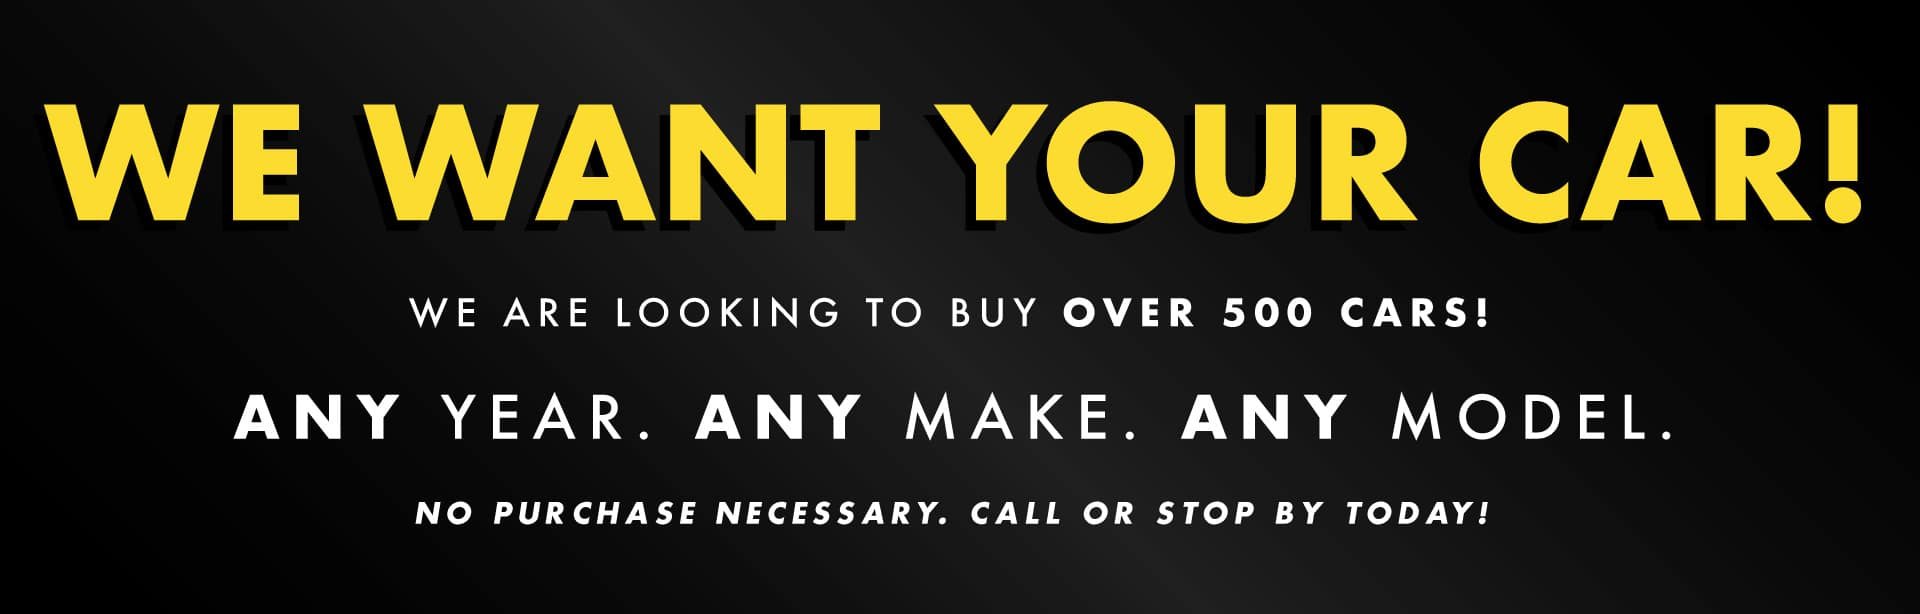 16513 kenaut Aug20 We Want Your Car Digital Graphics-1-1920X614